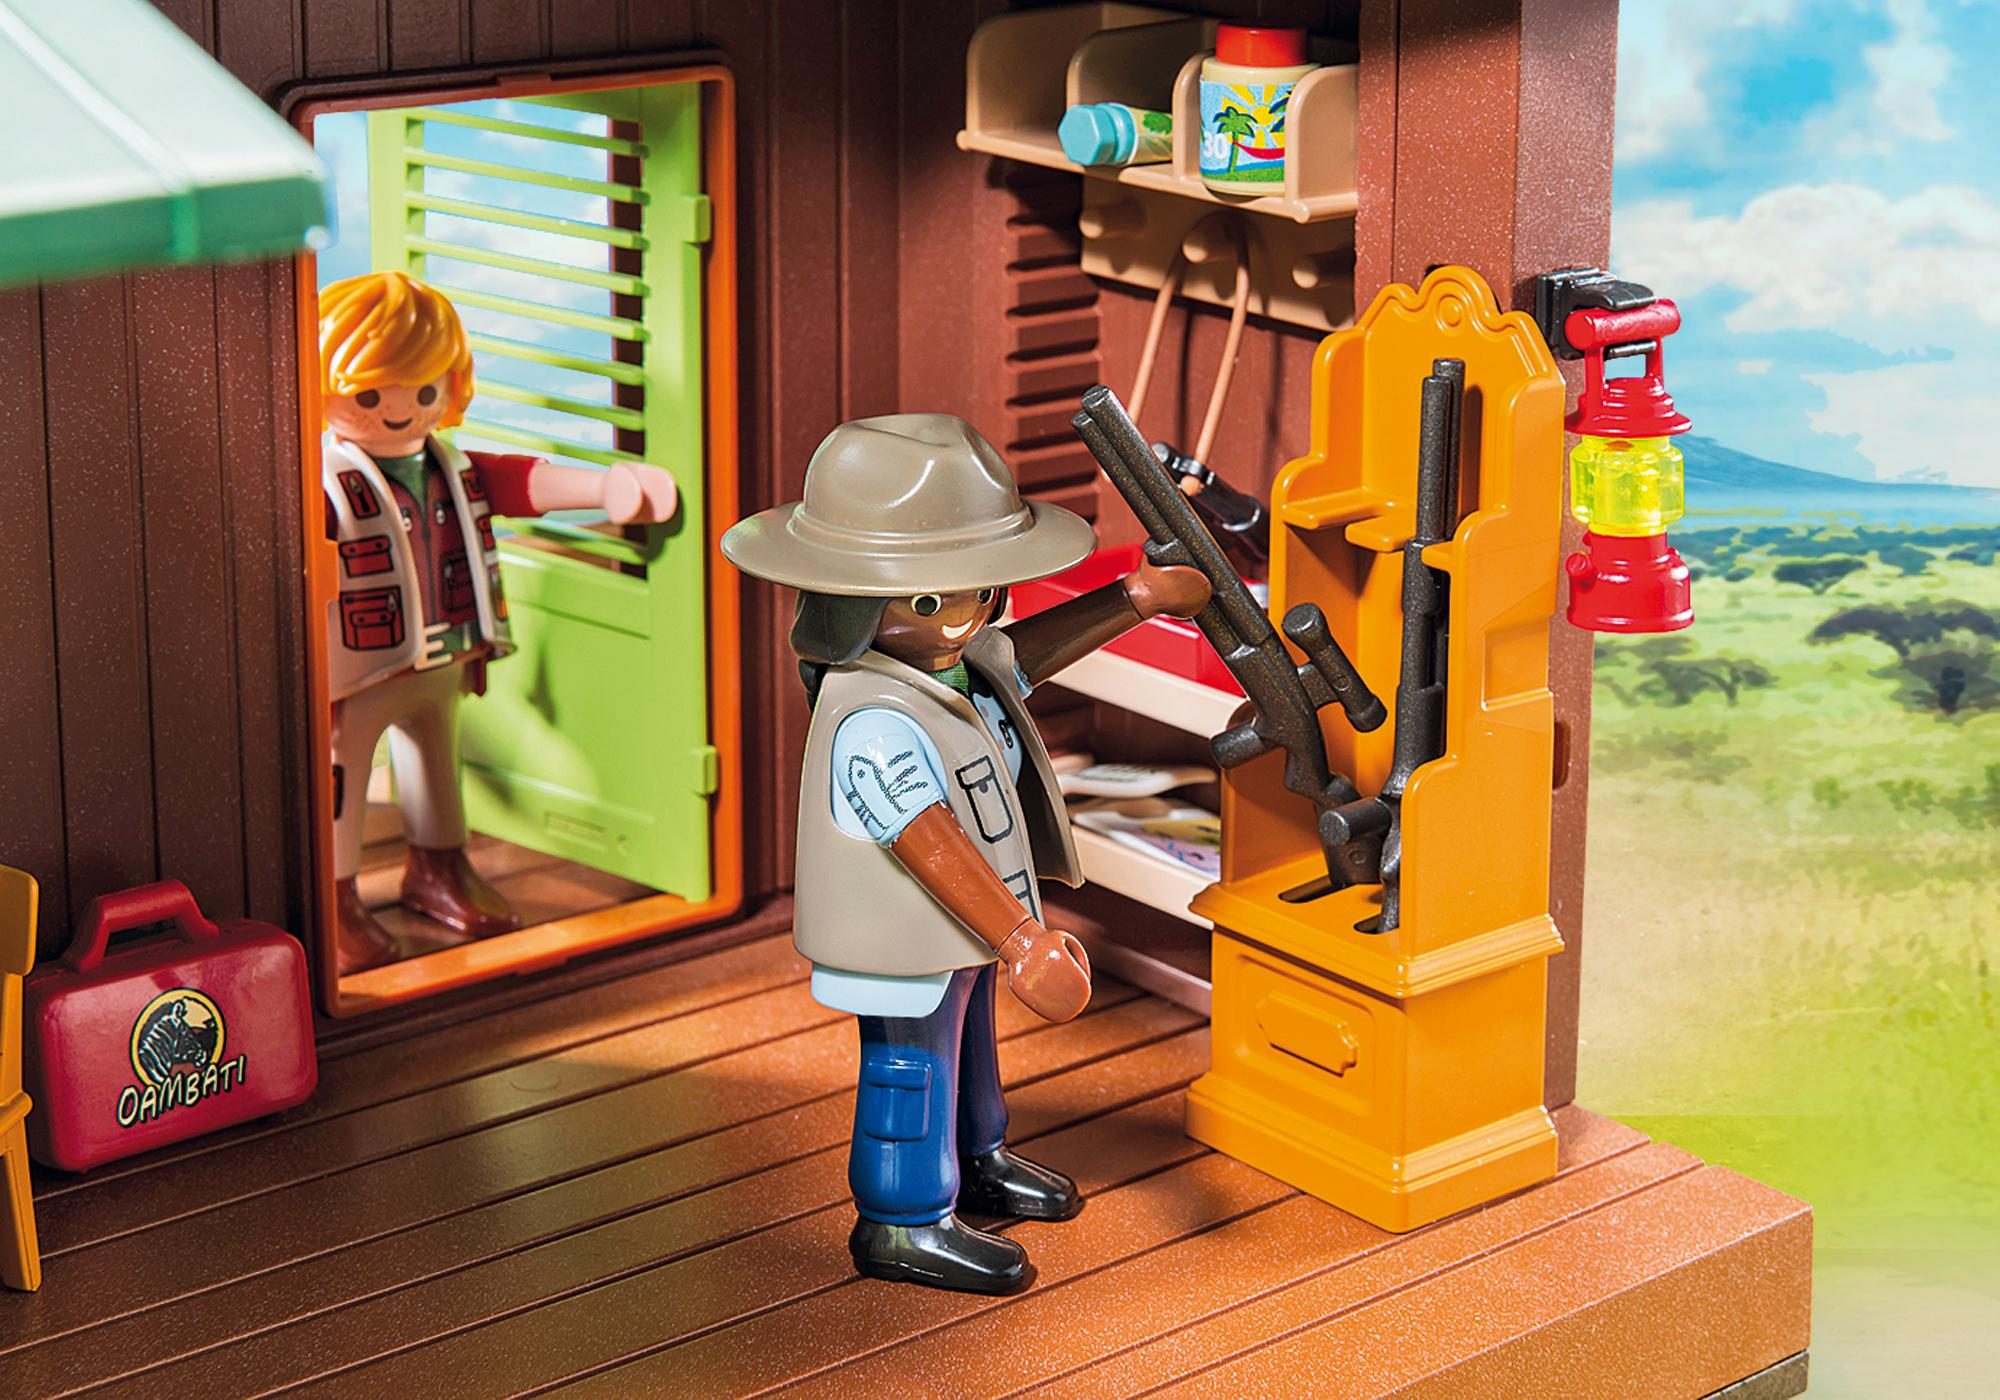 http://media.playmobil.com/i/playmobil/6936_product_extra1